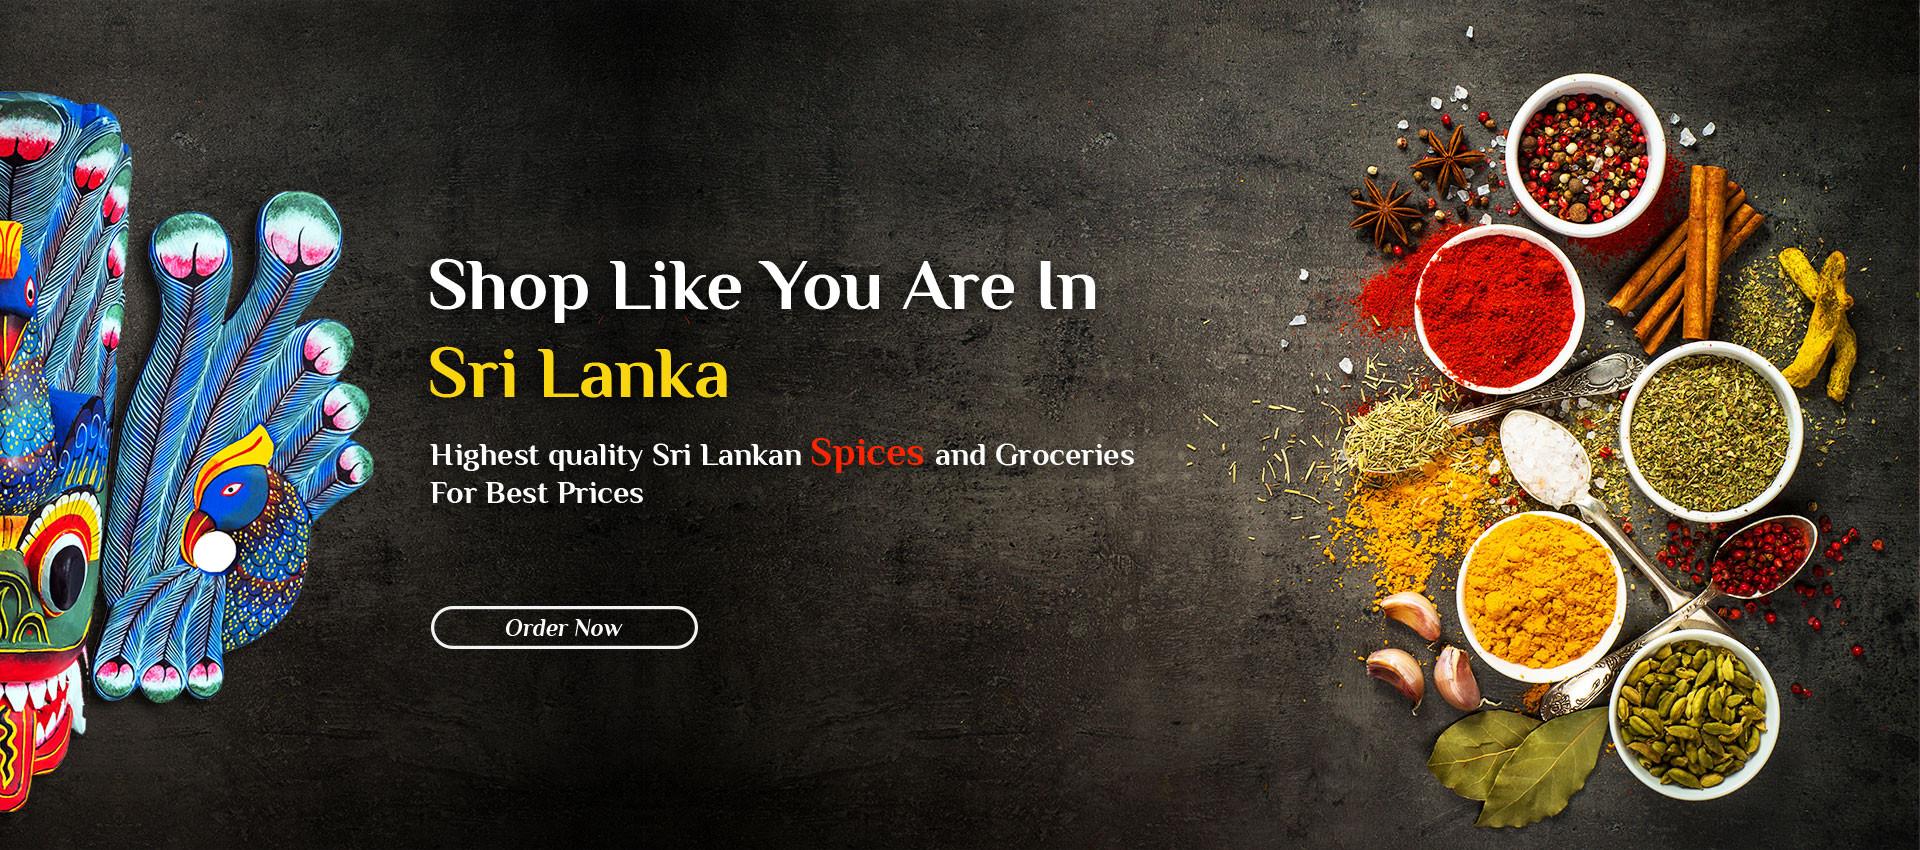 Spice Lanka Grocery